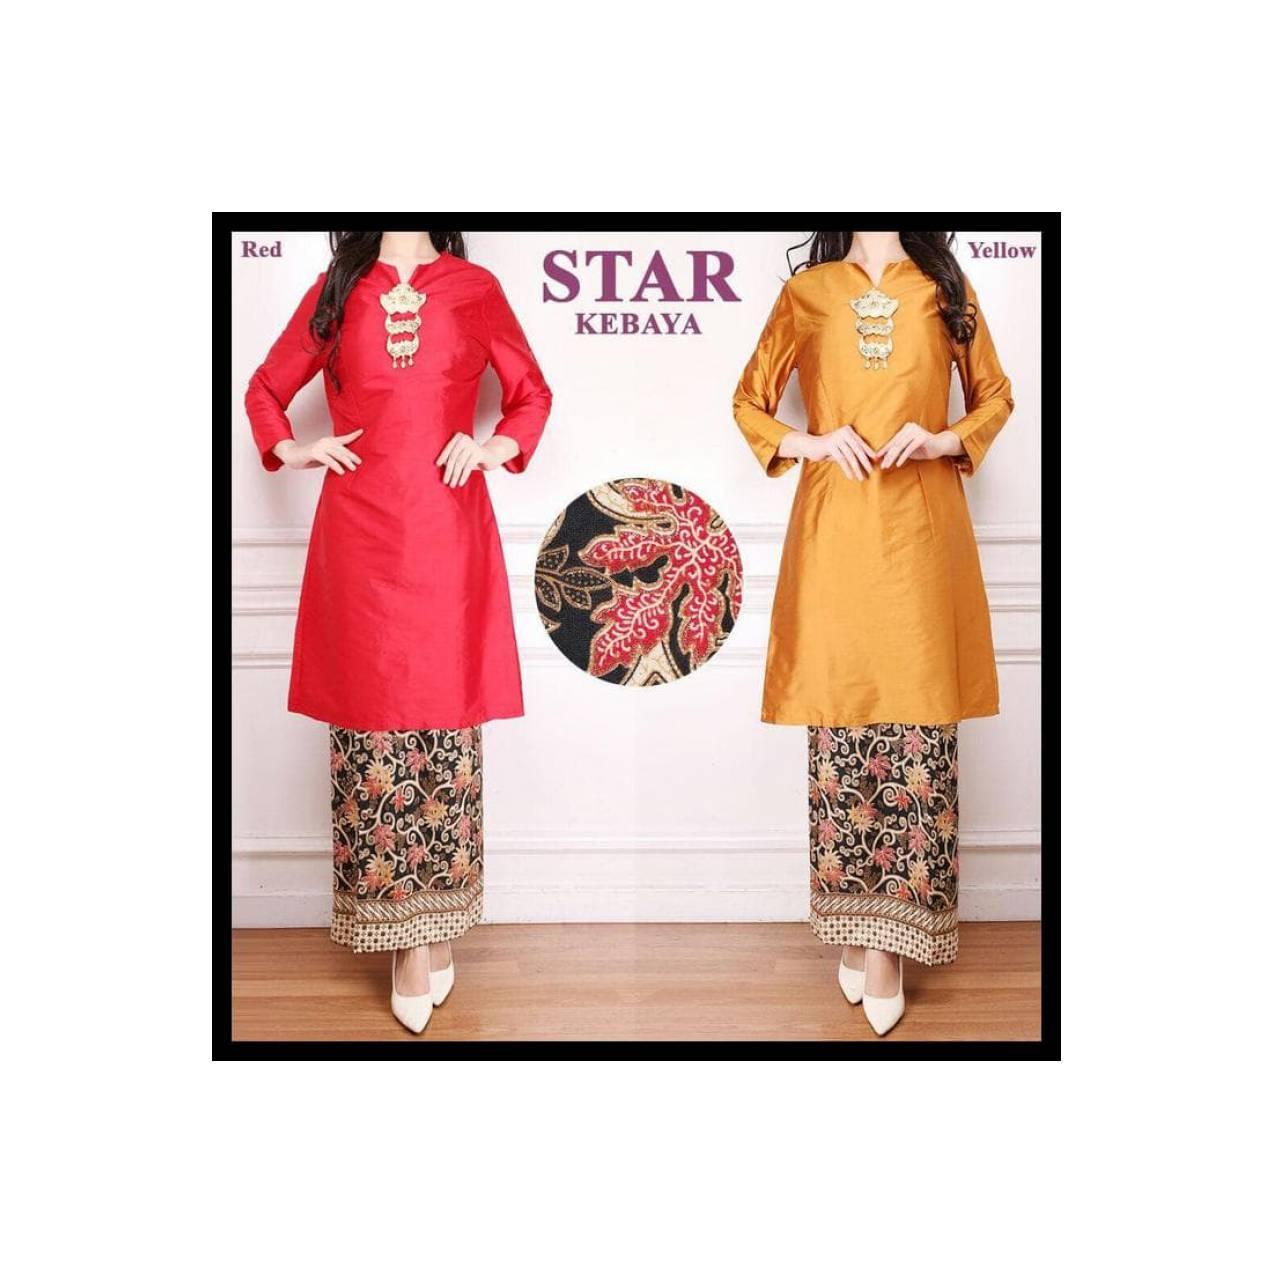 (Turun Harga!!) Baju Kurung Baju Malaysia Baju Melayu Taveta Merah Dan